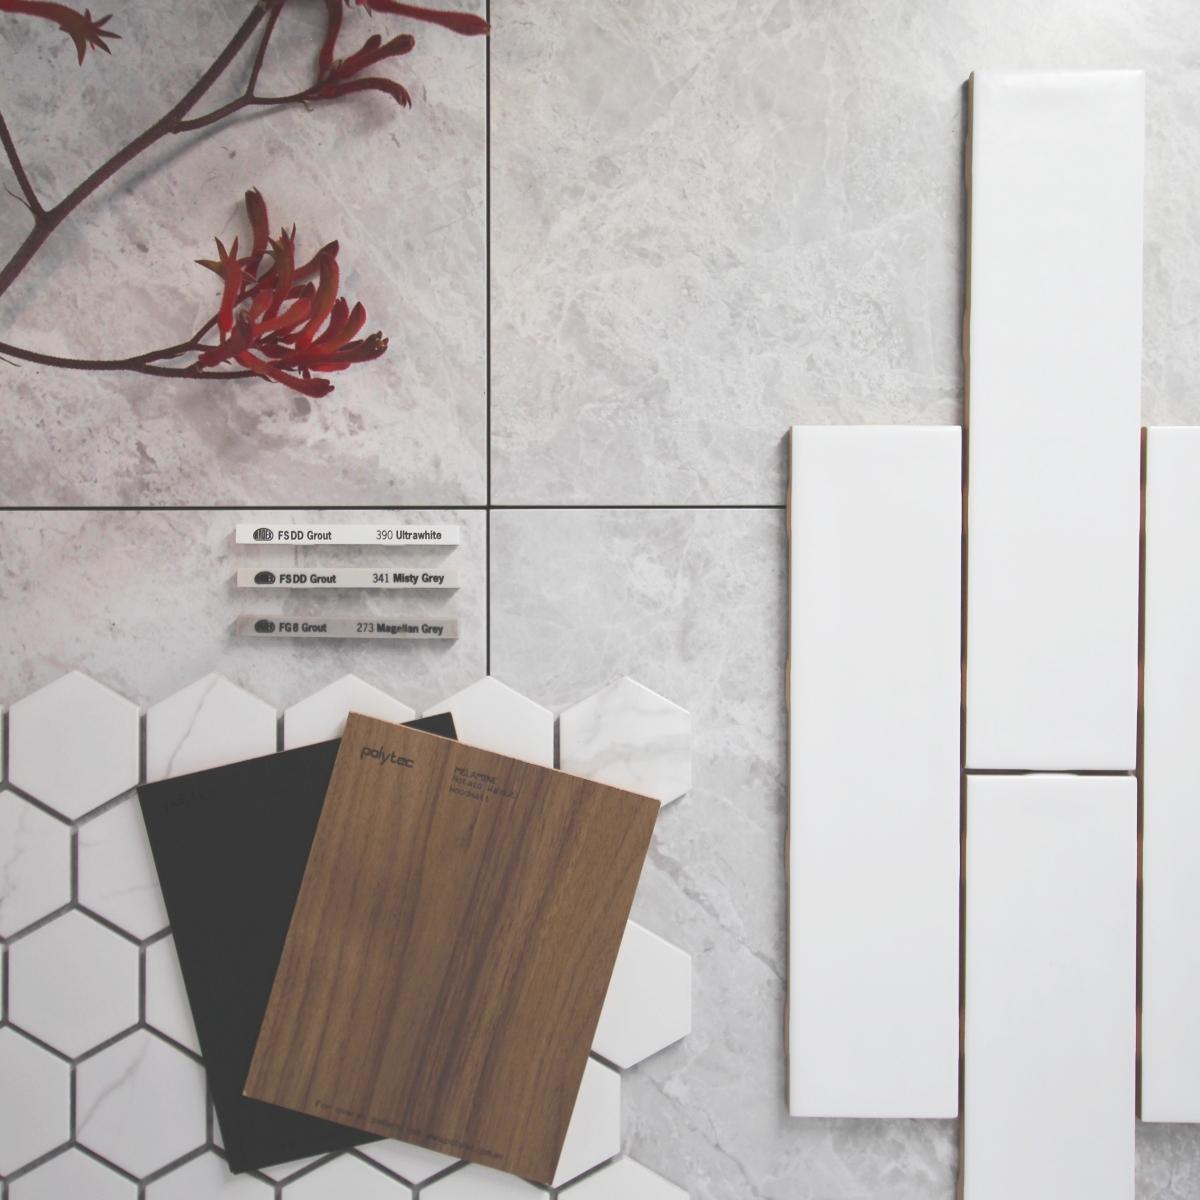 5 bathroom tile makeover ideas trending right now 24